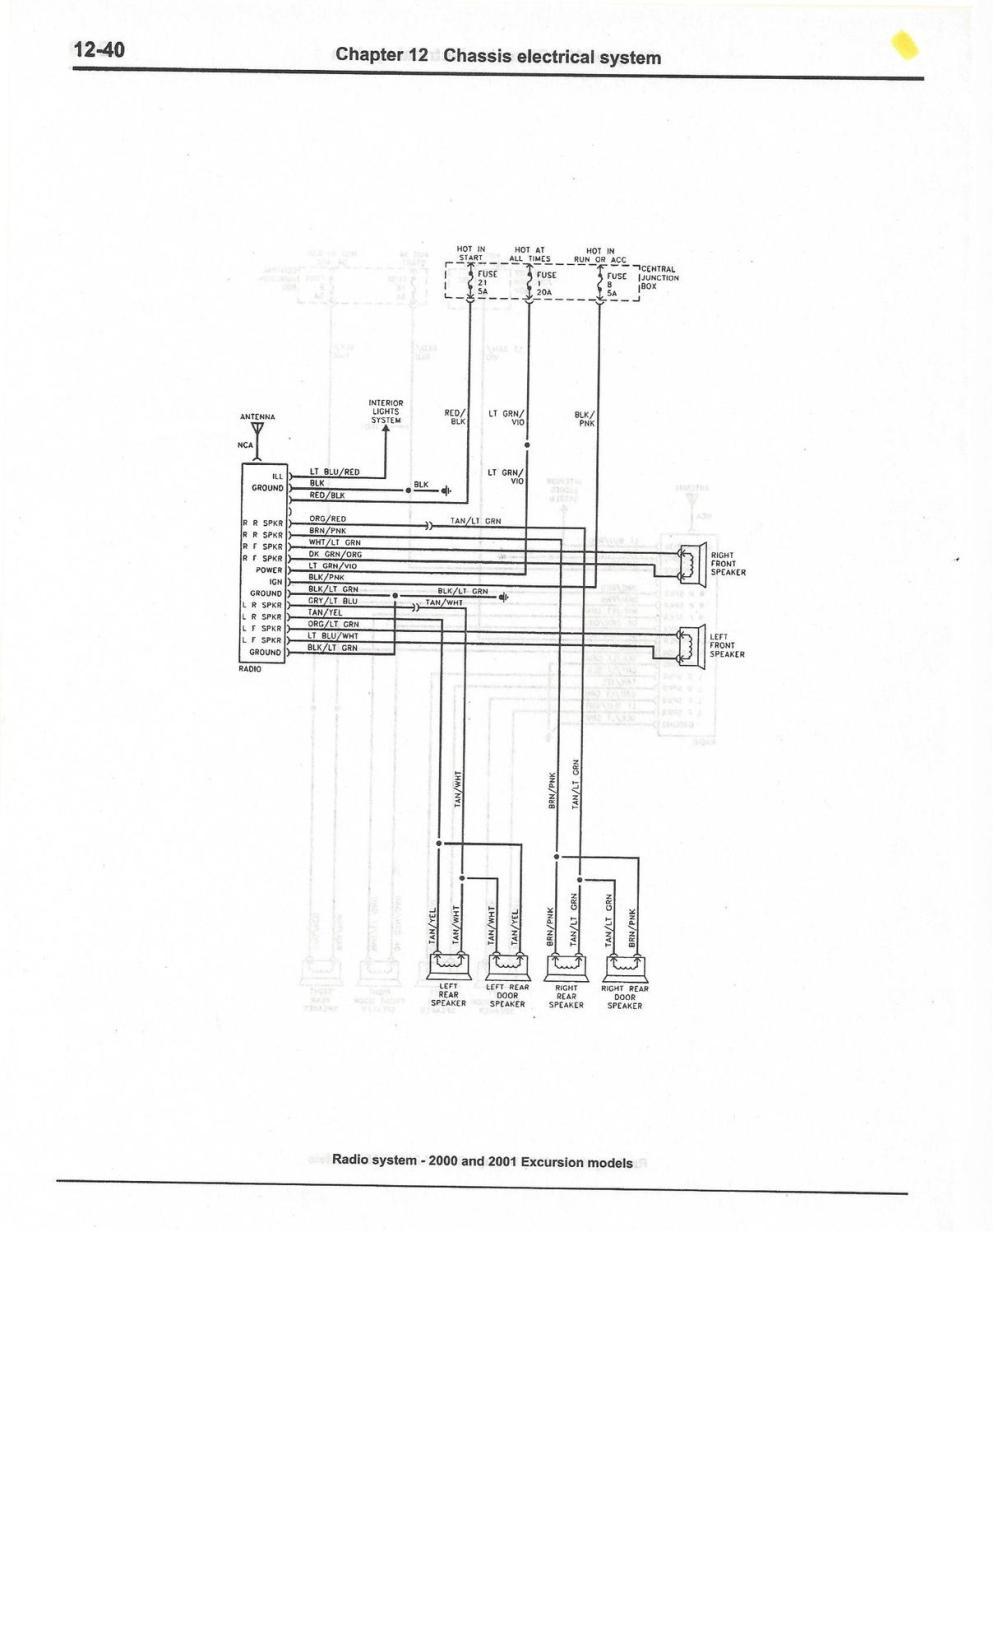 medium resolution of radio system 00 01 excursion